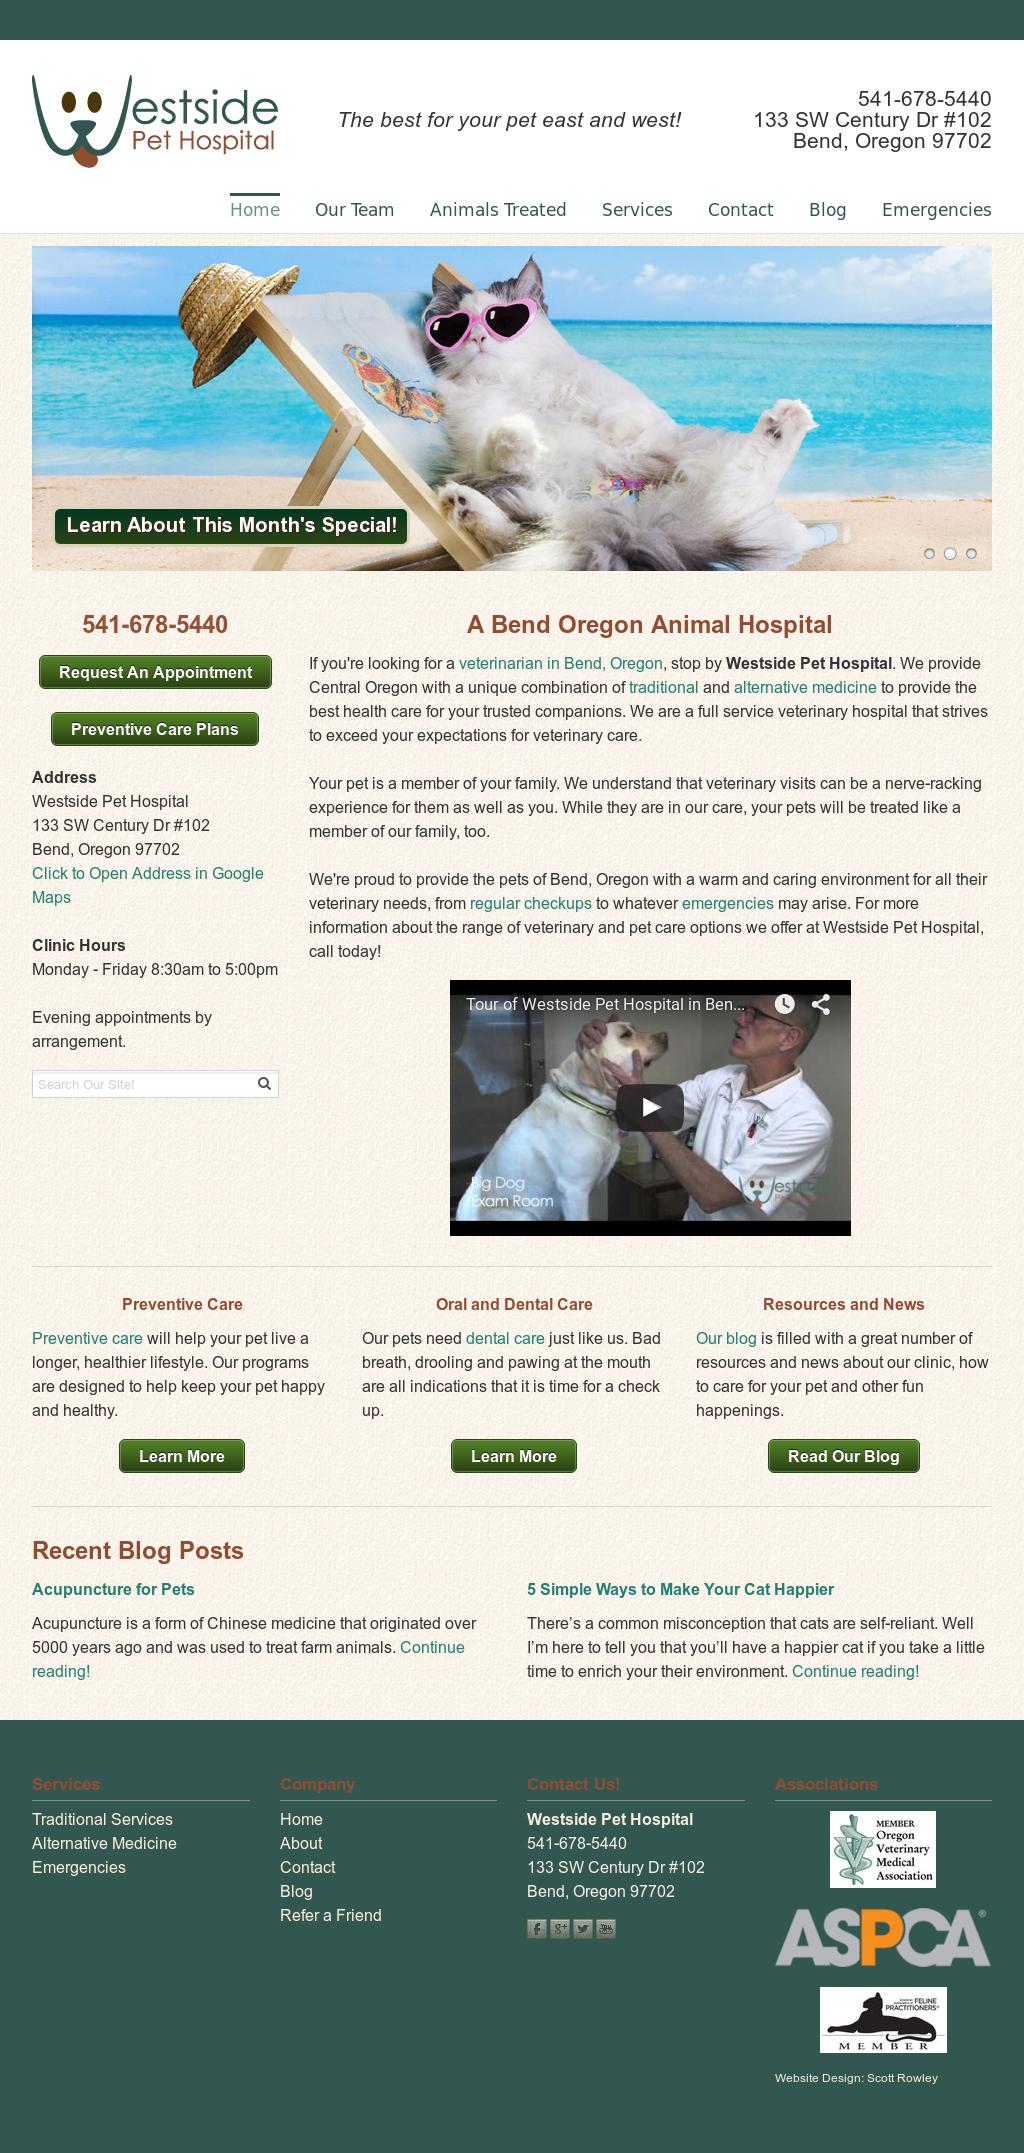 Westside Pet Hospital Bend Competitors, Revenue and